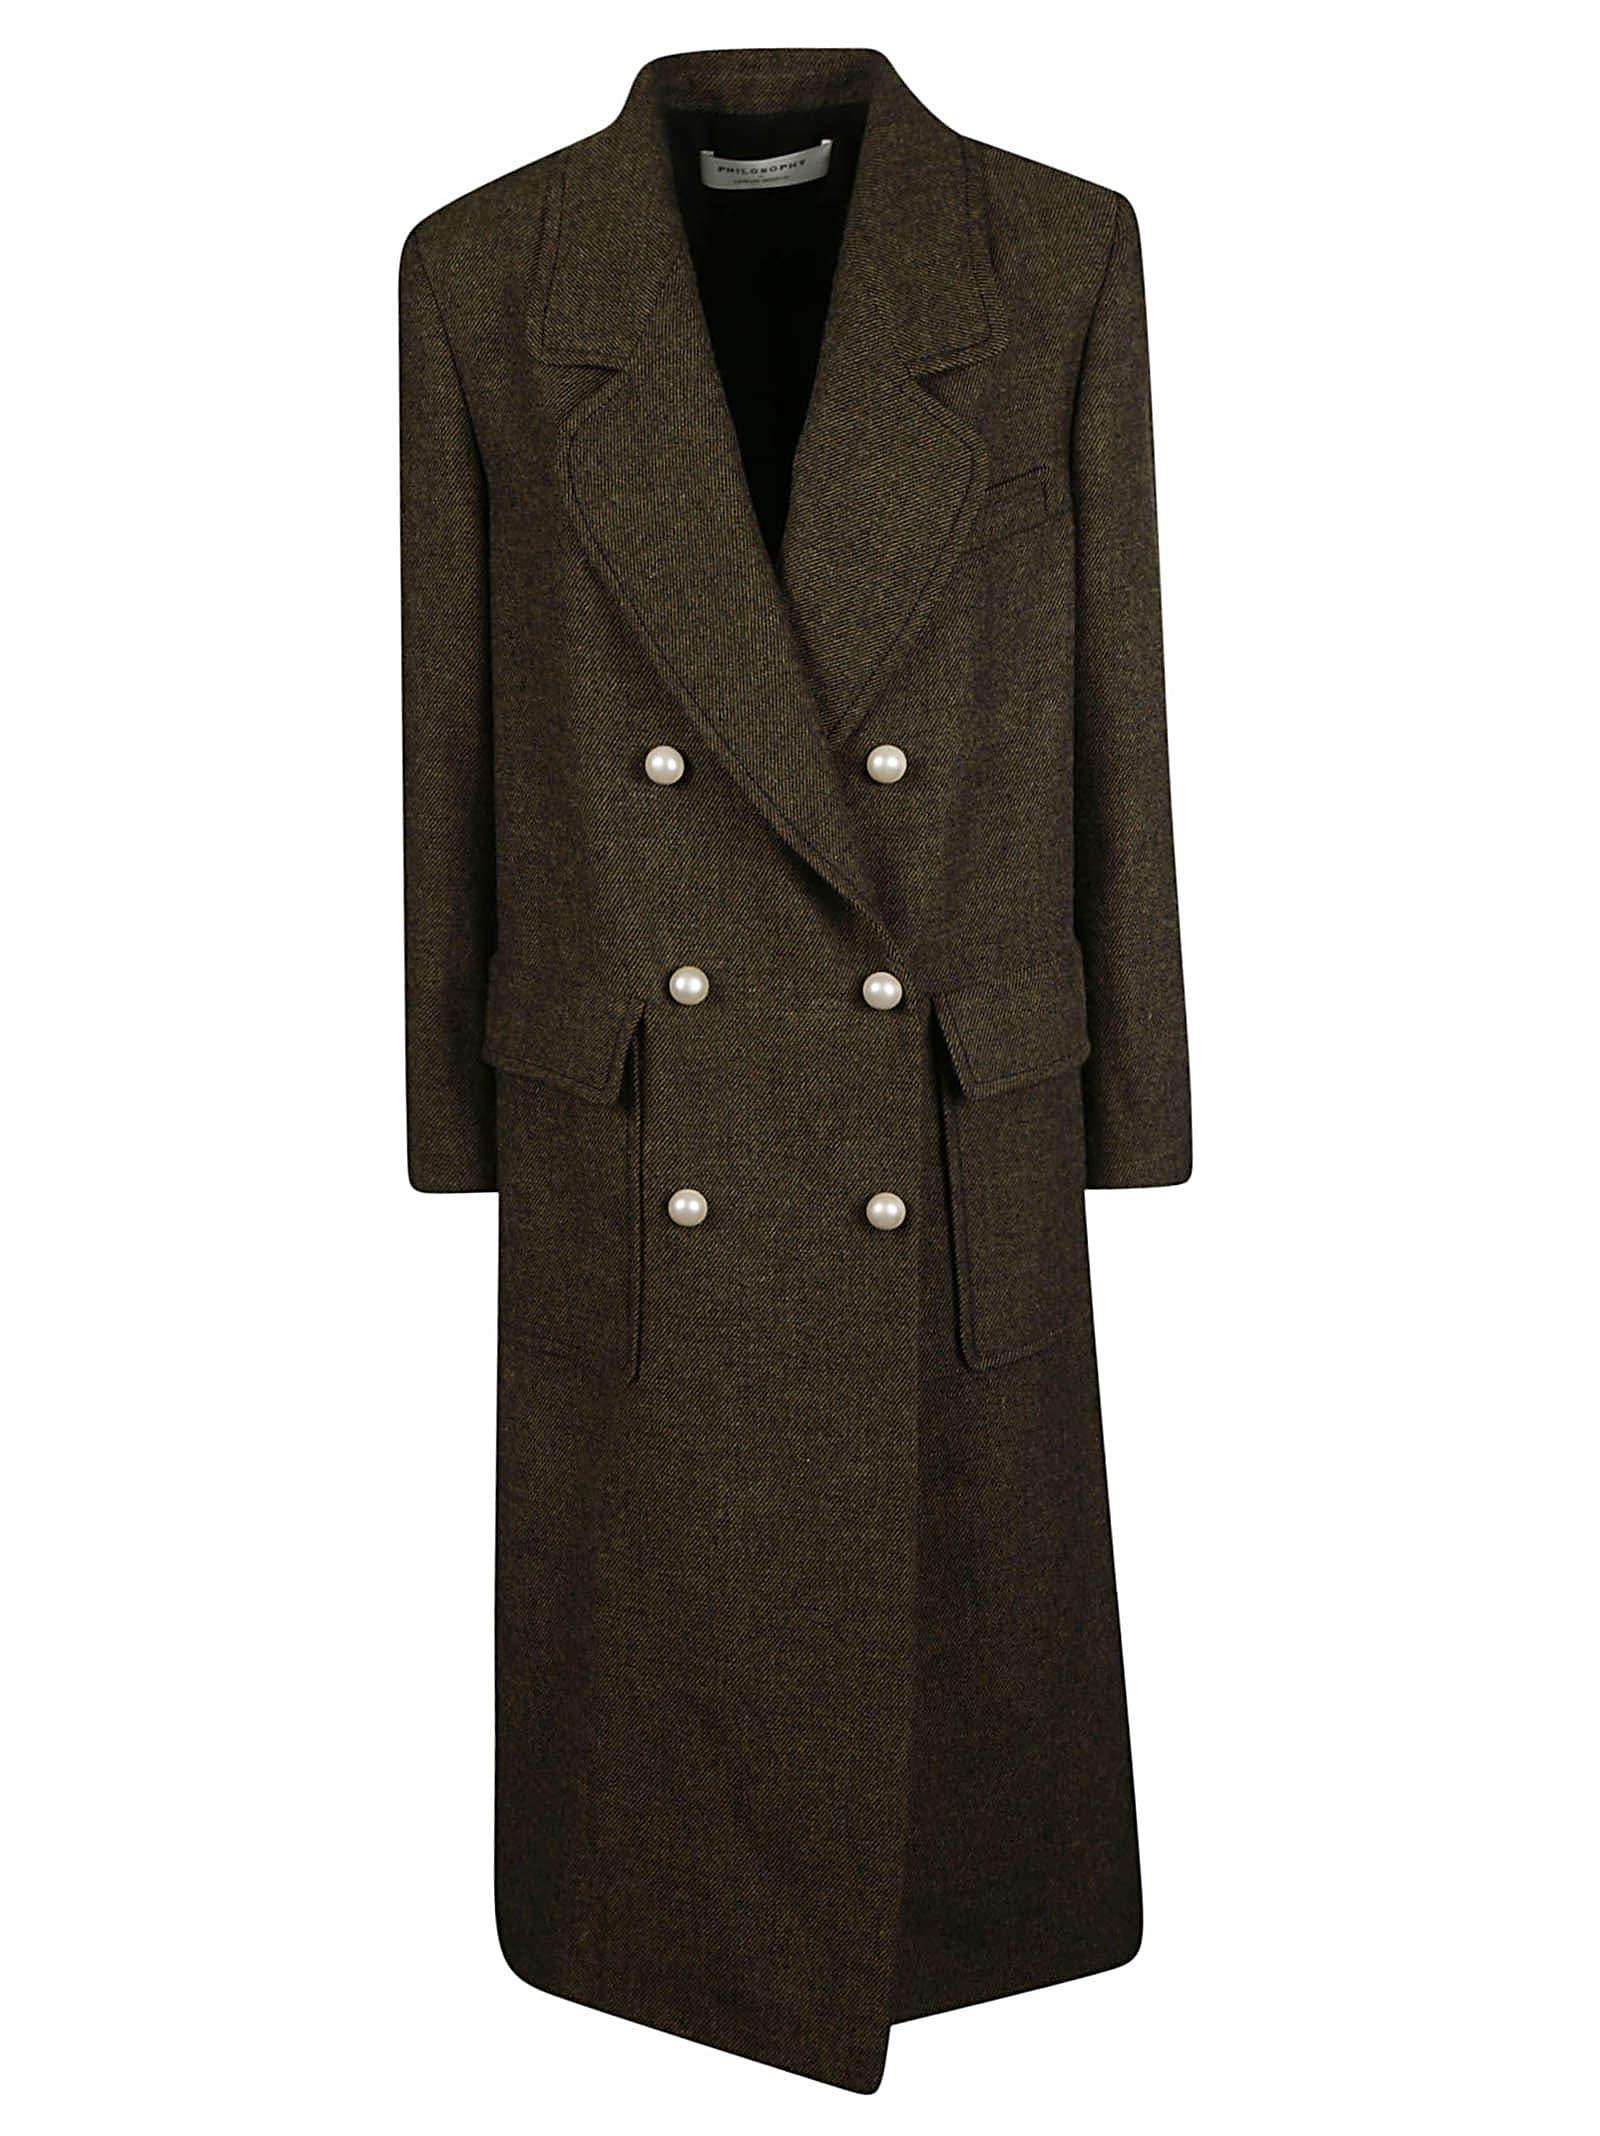 Philosophy di Lorenzo Serafini Double Breasted Coat